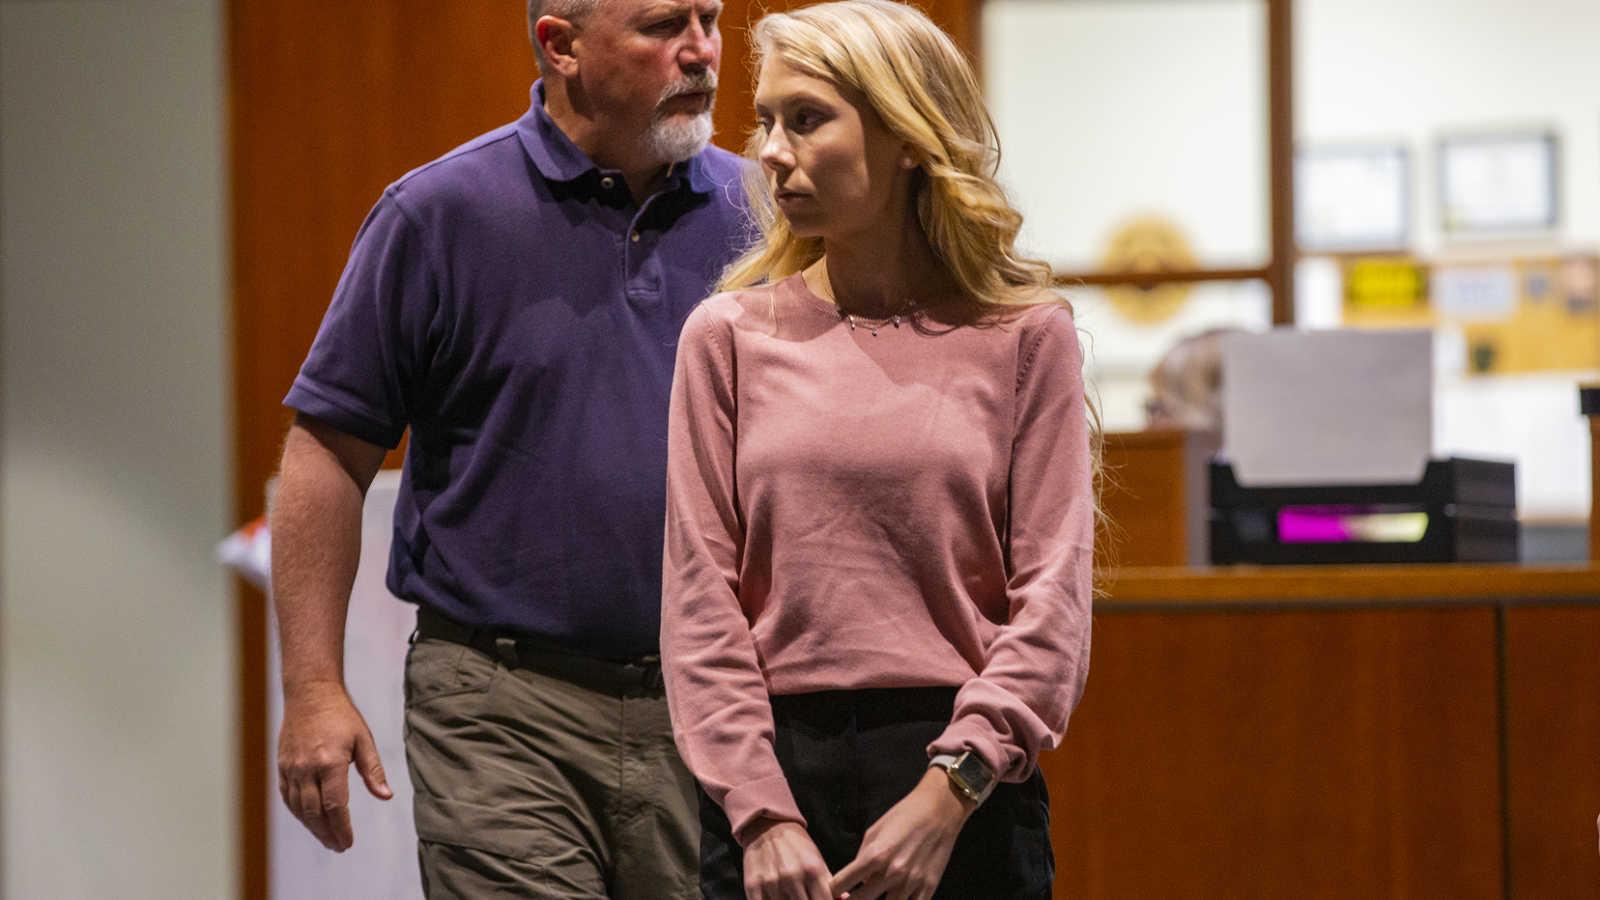 SEE OHIO CHEERLEADER INTERROGATION: Brooke Skylar Richardson sobs, confesses to burying newborn in yard - CrimeOnline